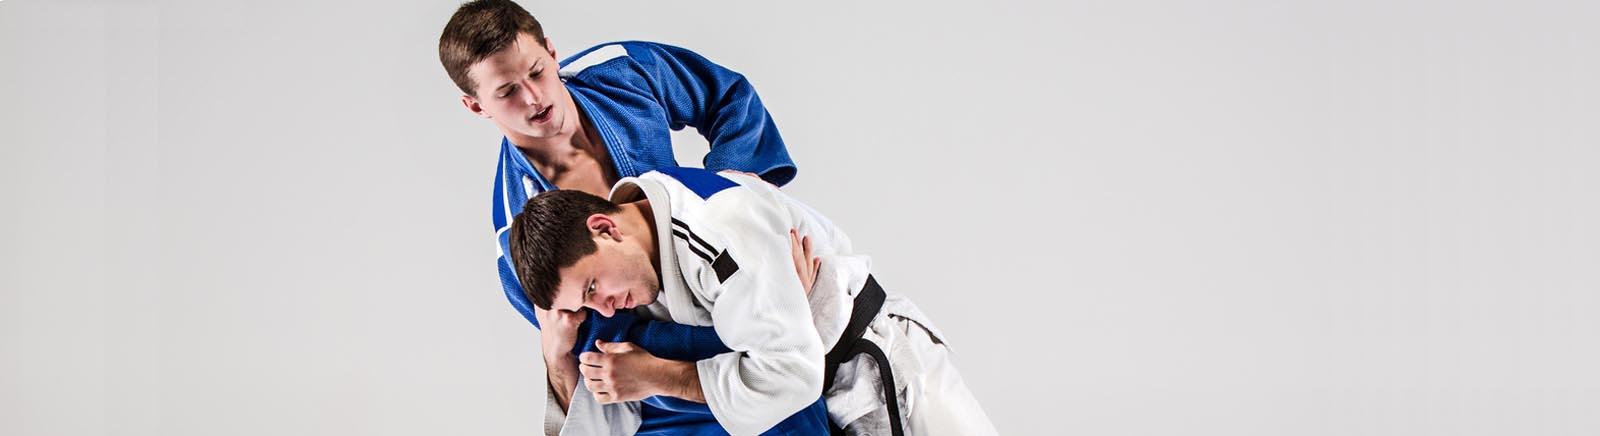 Judo post image